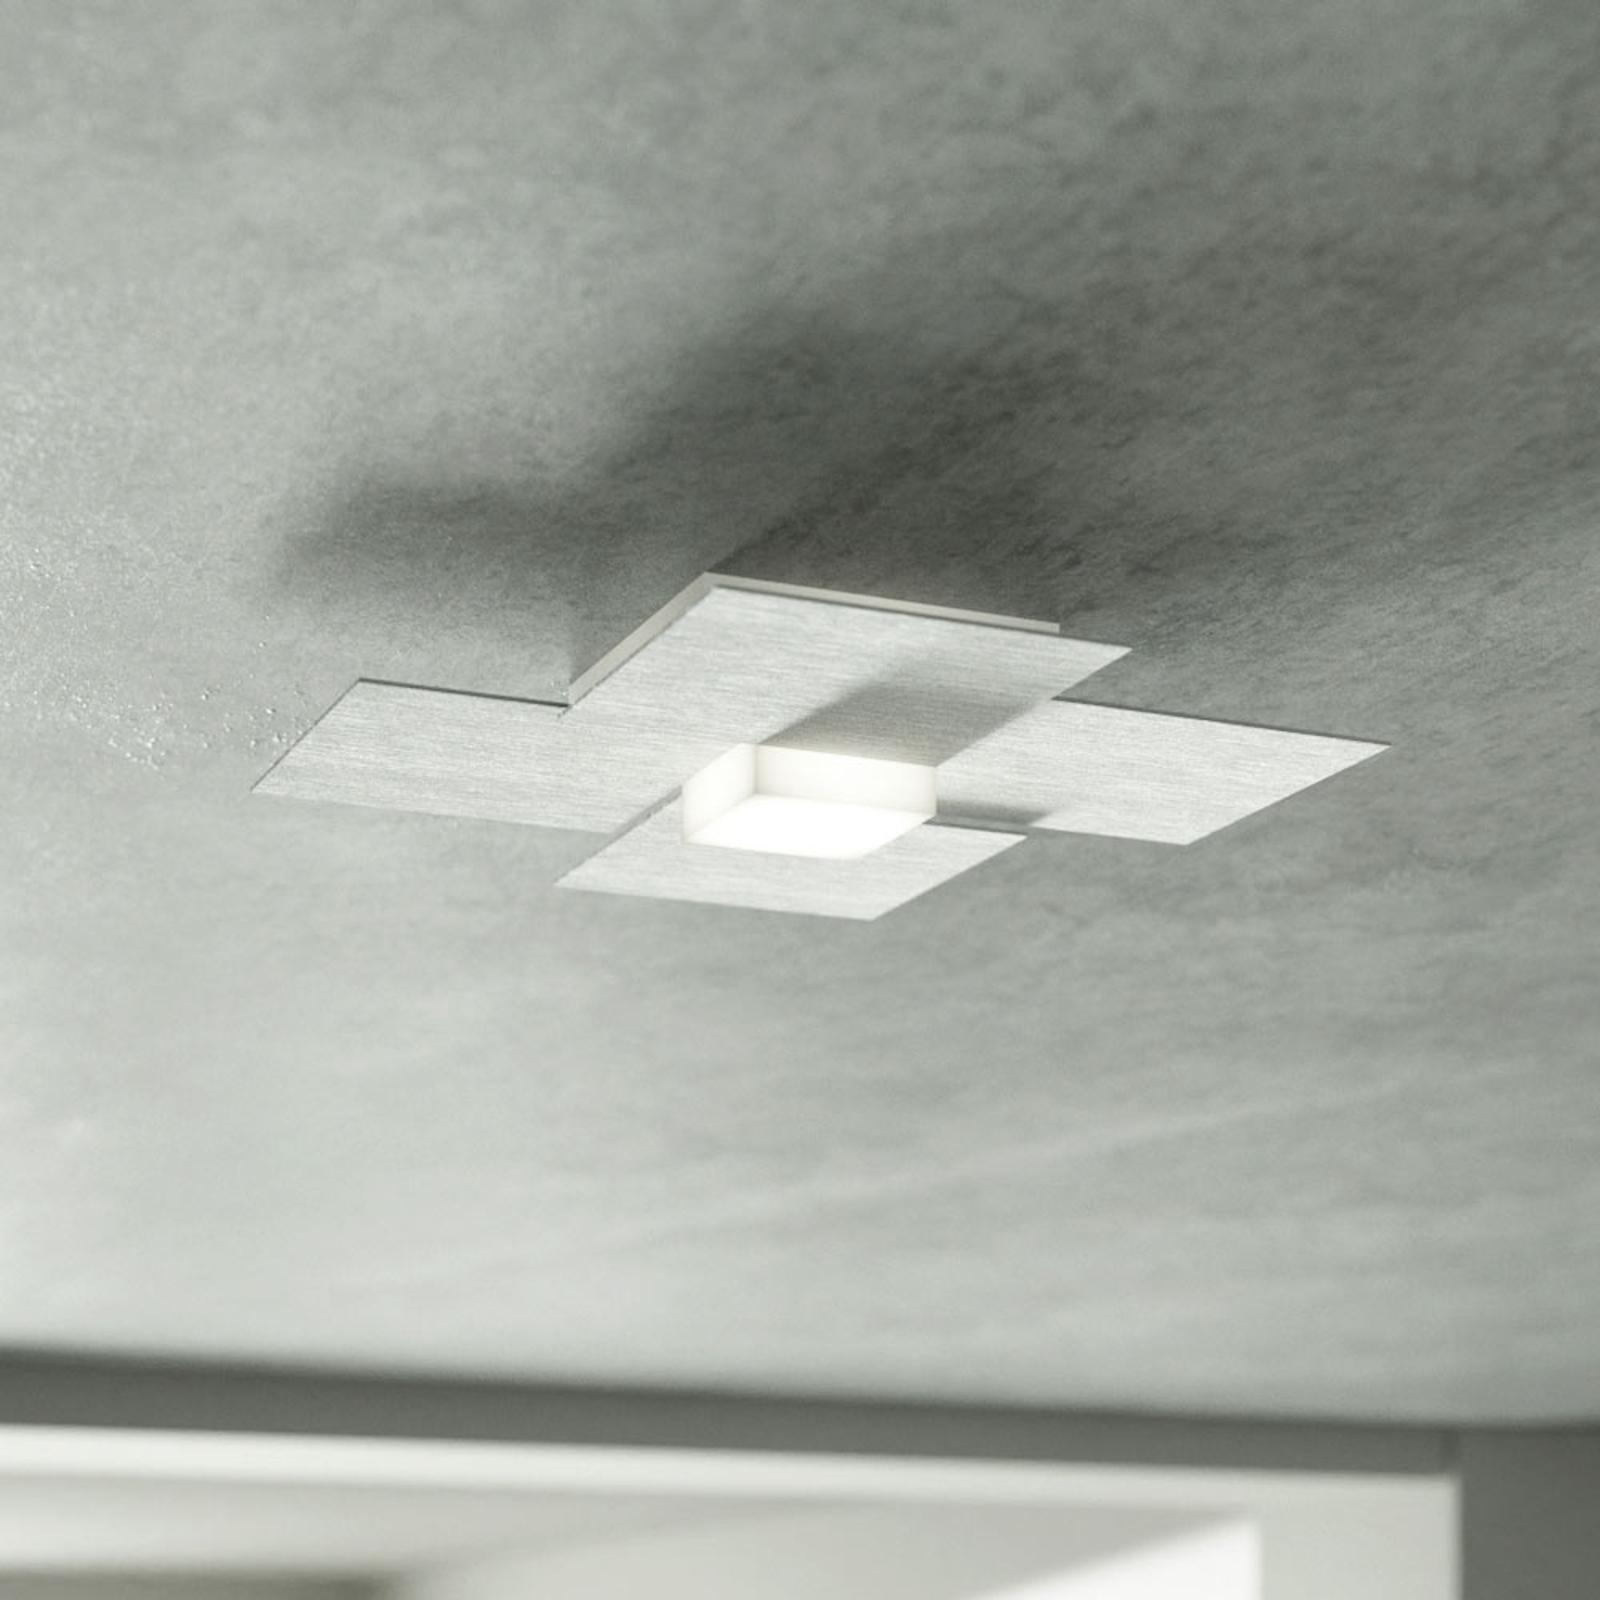 GROSSMANN Creo LED-taklampe, børstet aluminium